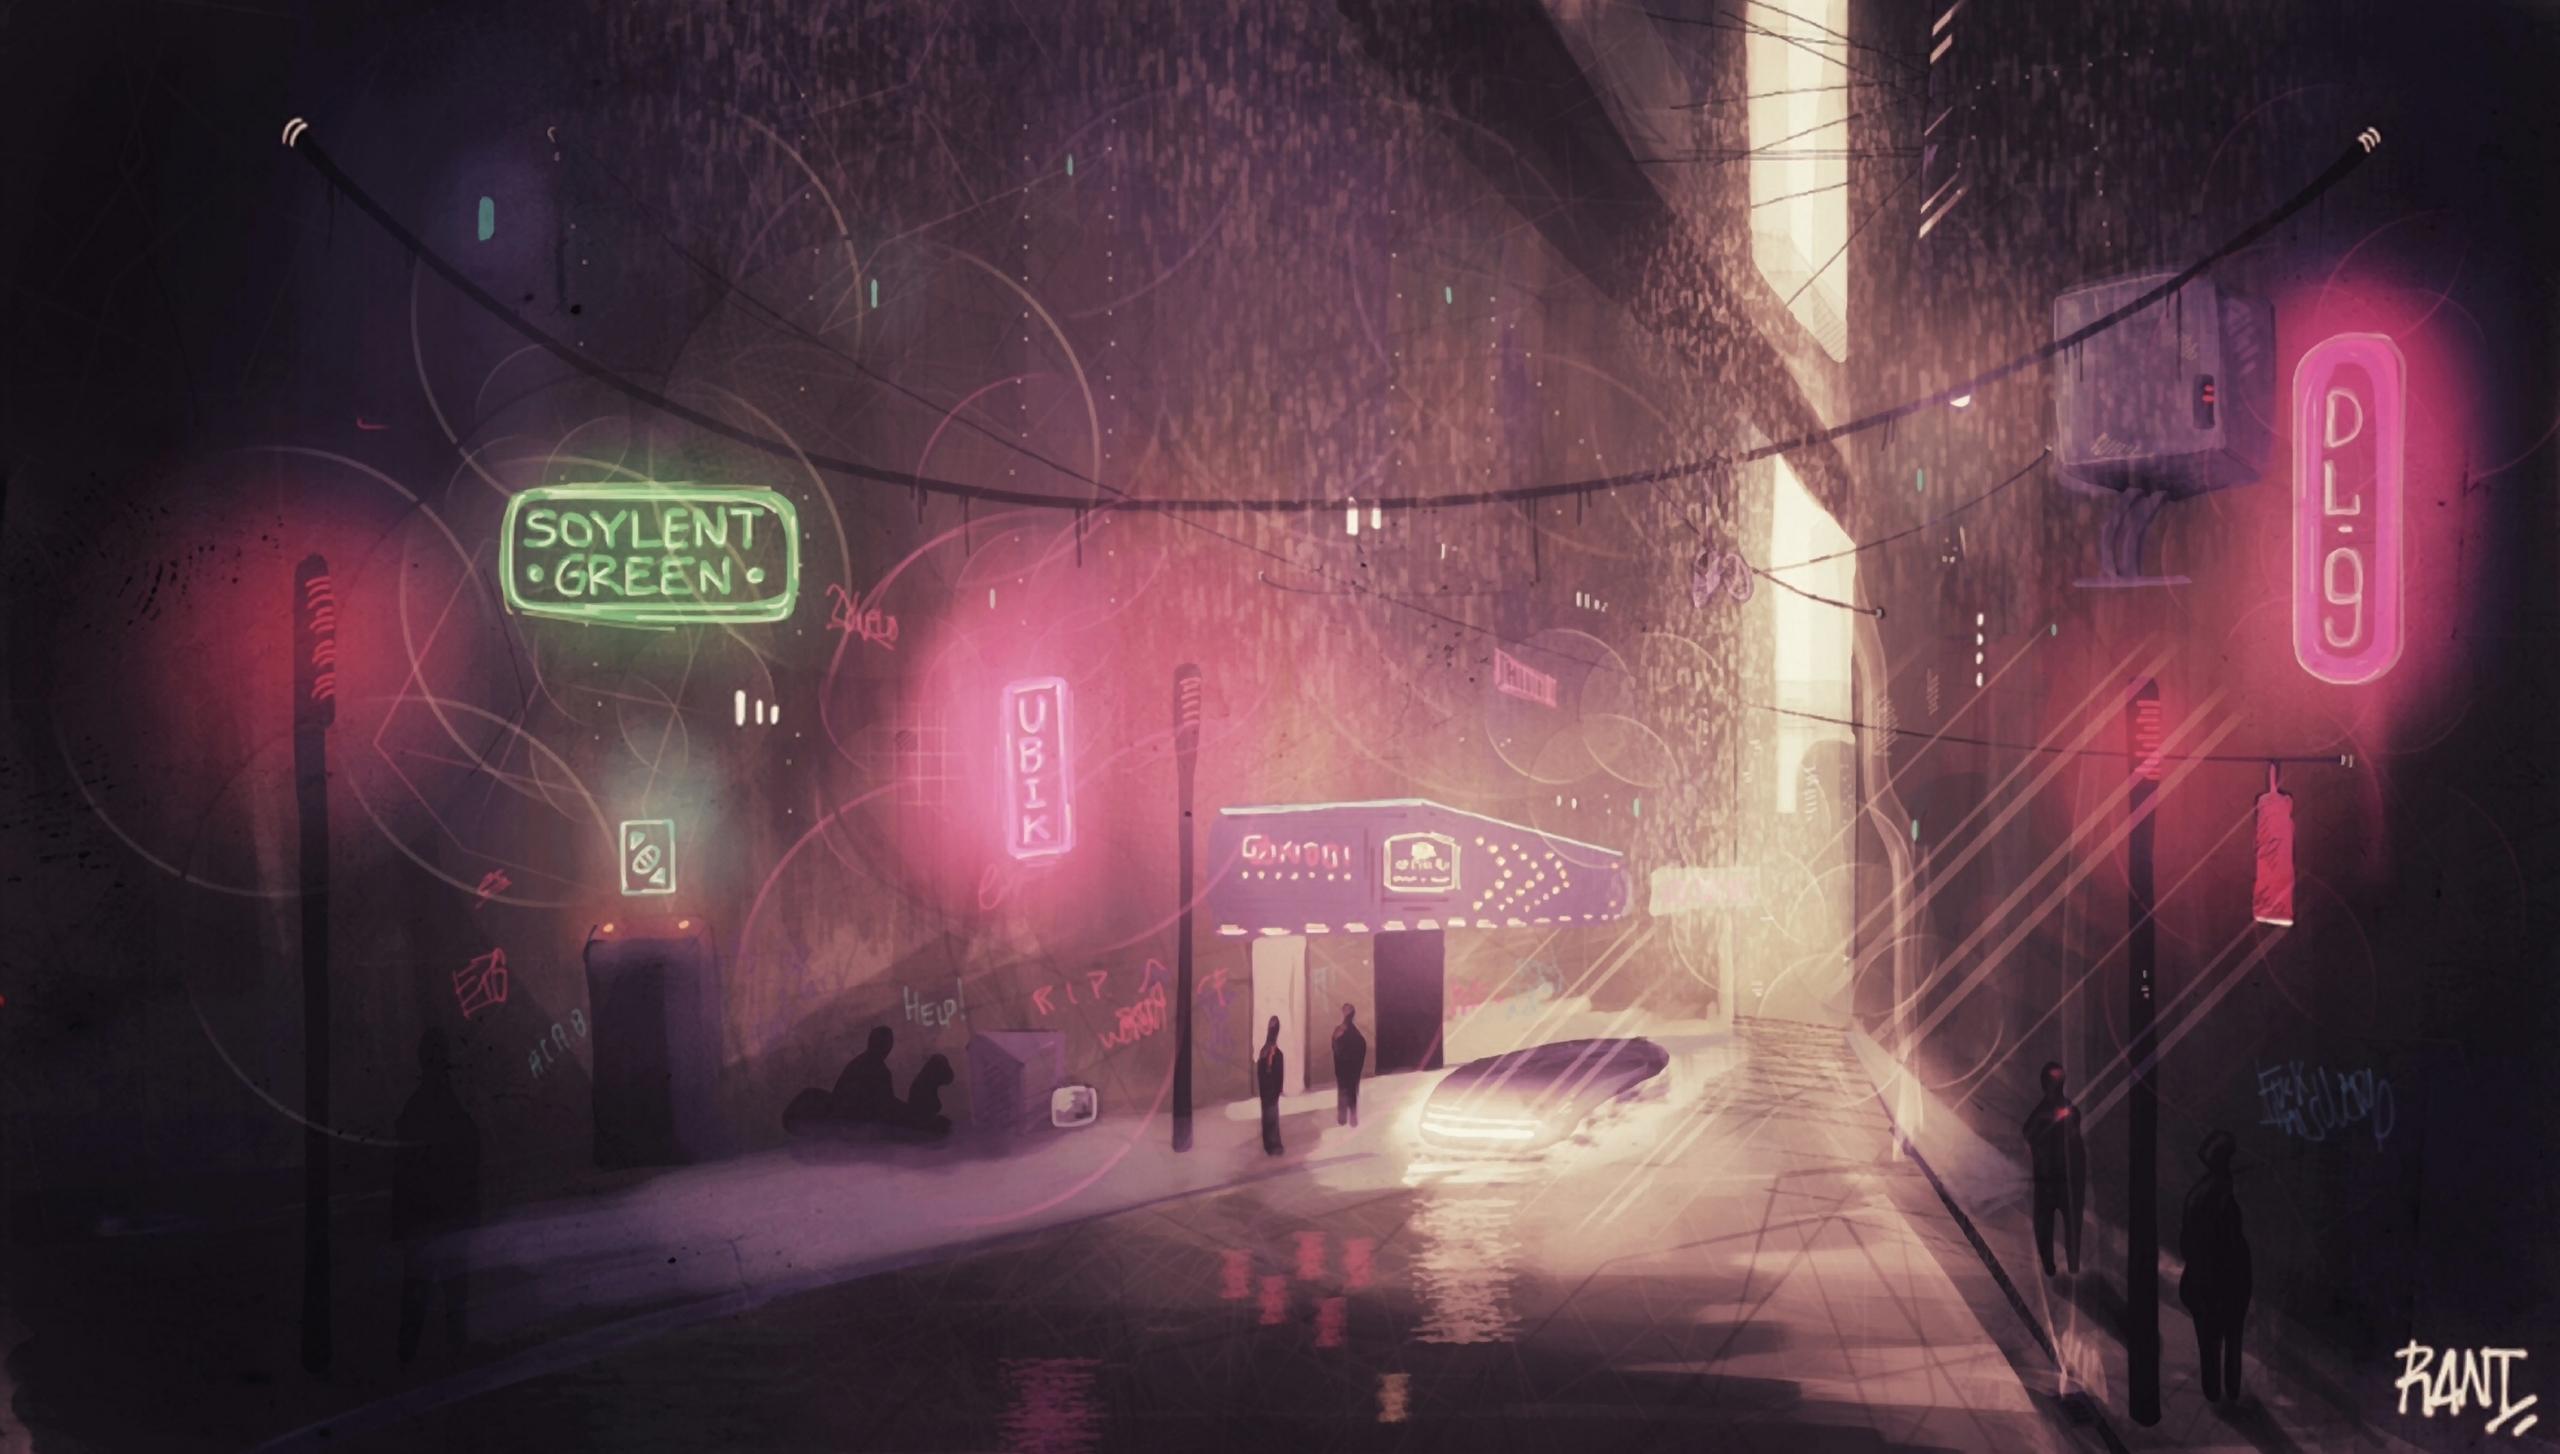 Cyberpunk city concept art proc - rantart | ello